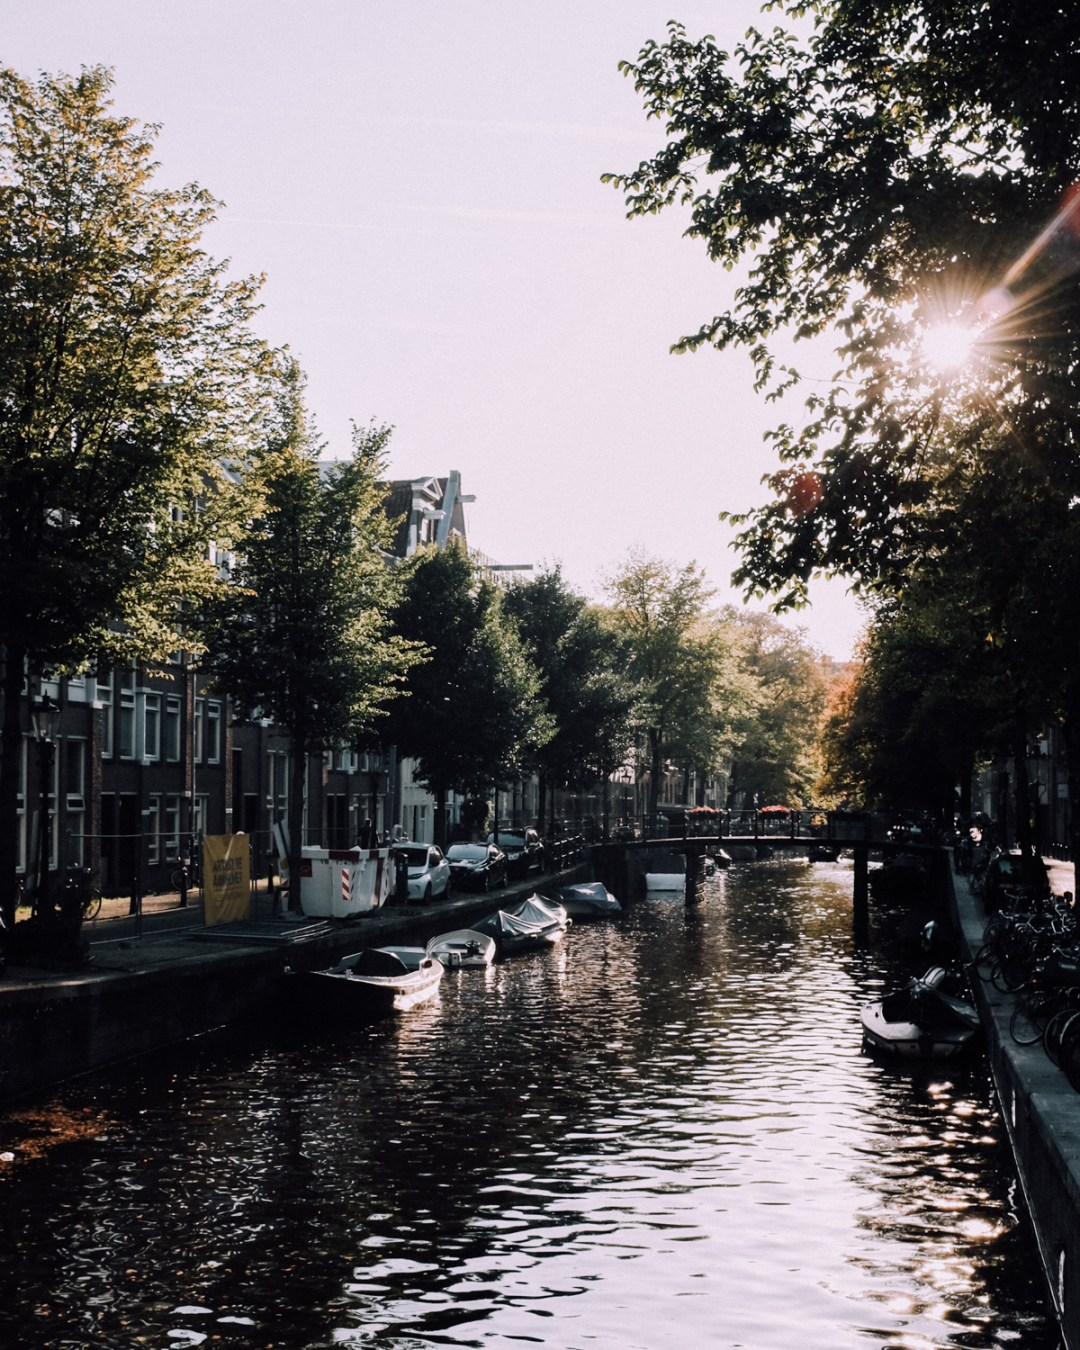 inastil, Ü50Blog, Amsterdam, Citytrip, Reiseblogger, Amsterdamtipps, Städtereise, Ü50Reiseblogger, Herbst in Amstrdam-25